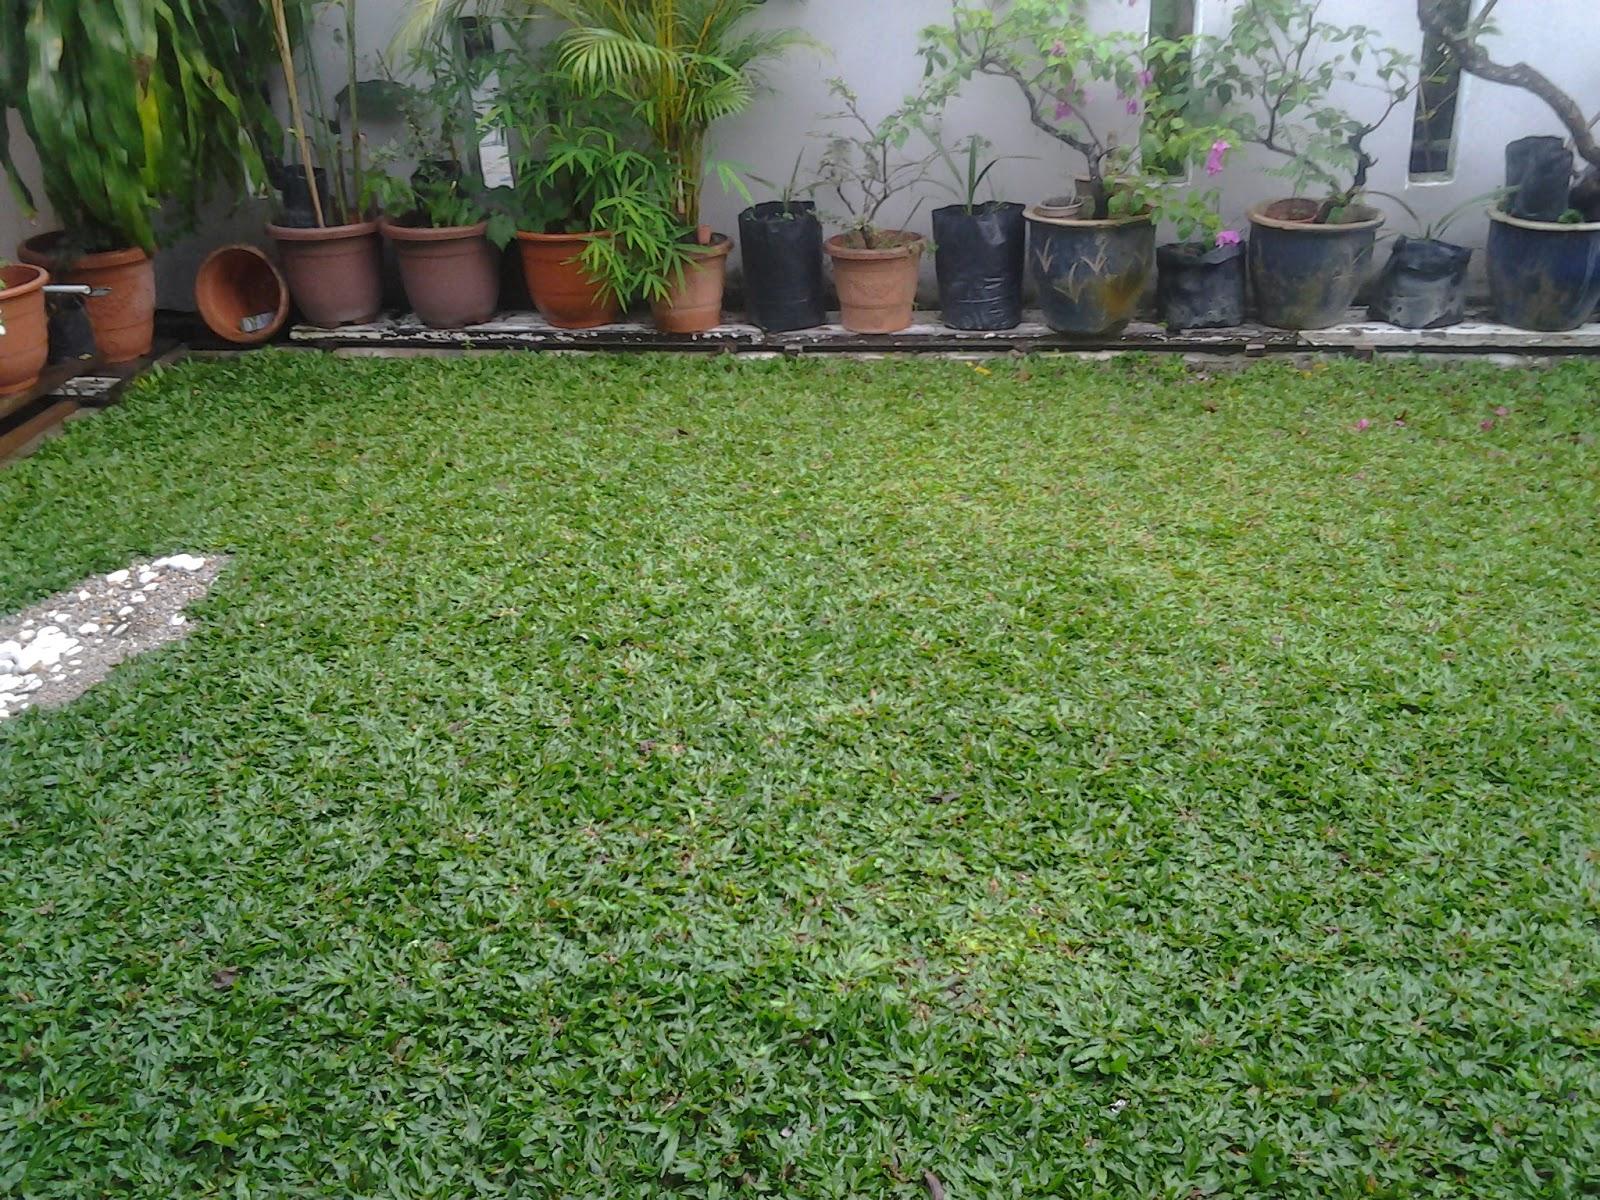 Terbaru 33 Cara Menanam Rumput Mutiara Cara menanam rumput mutiara